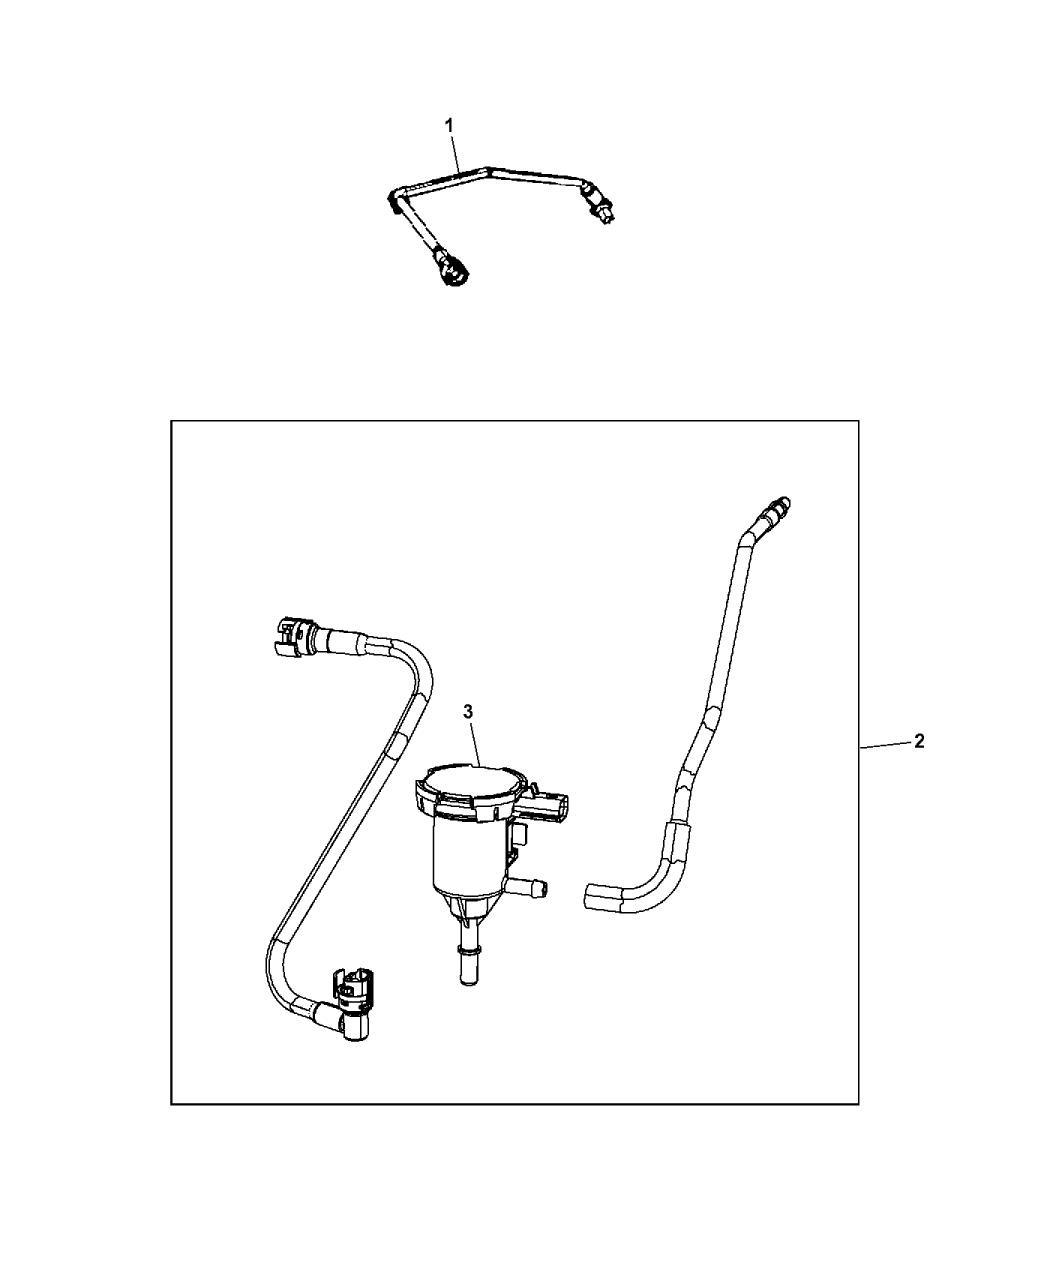 2014 Jeep Patriot Emission Control Vacuum Harness